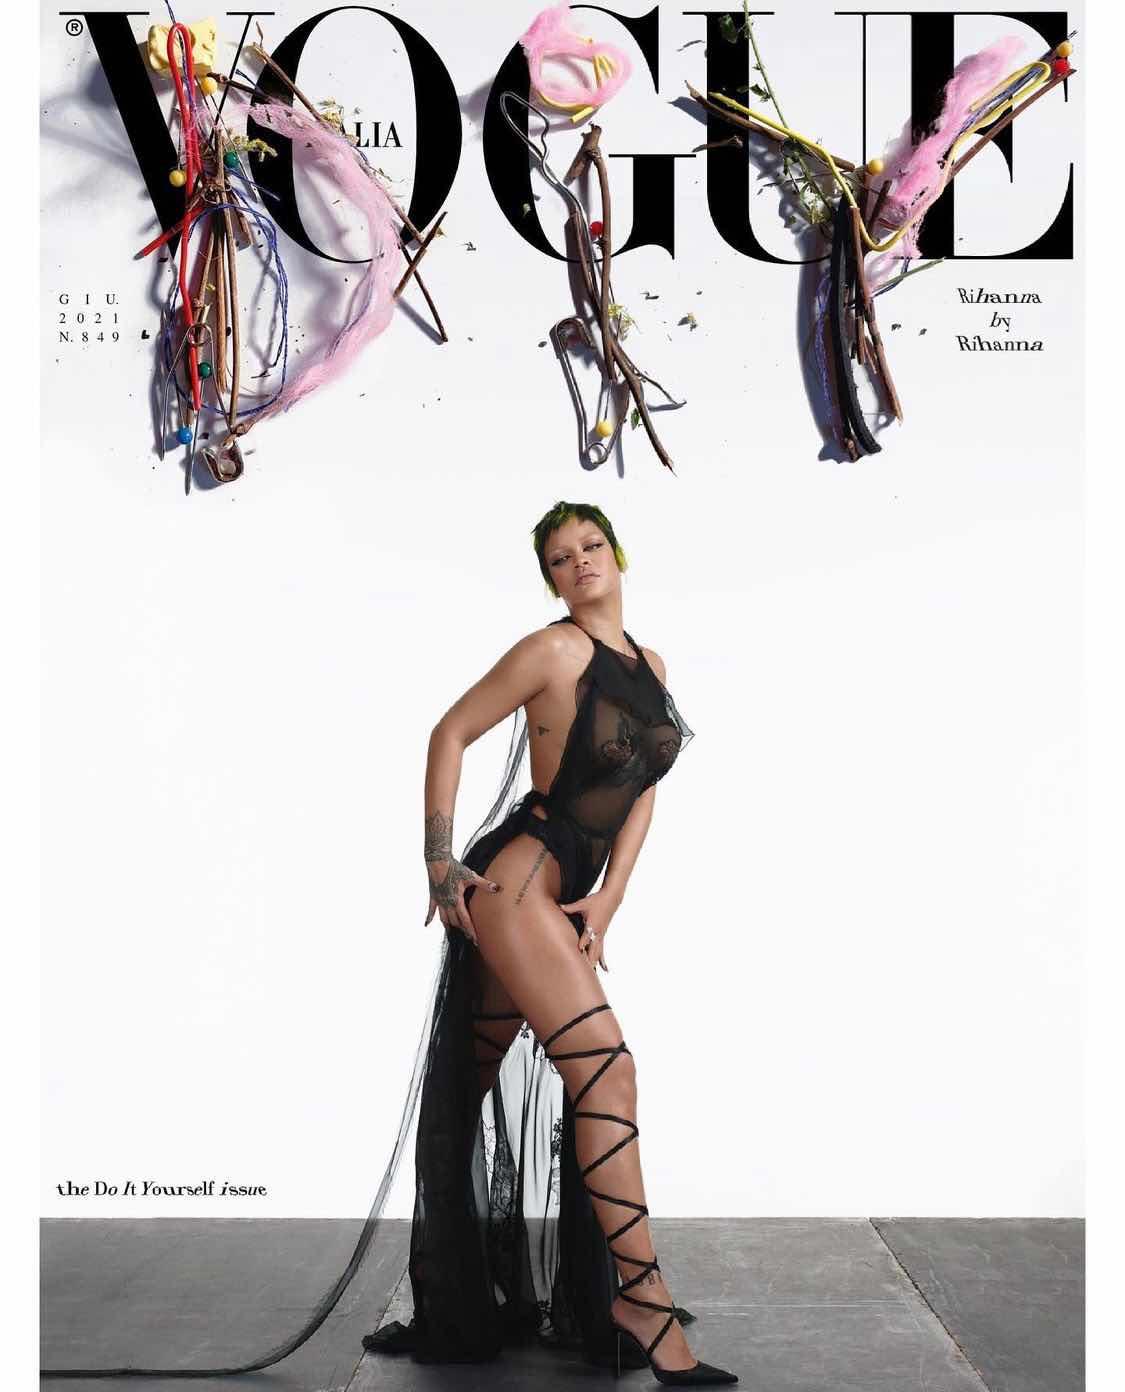 Rihanna for Italian Vogue